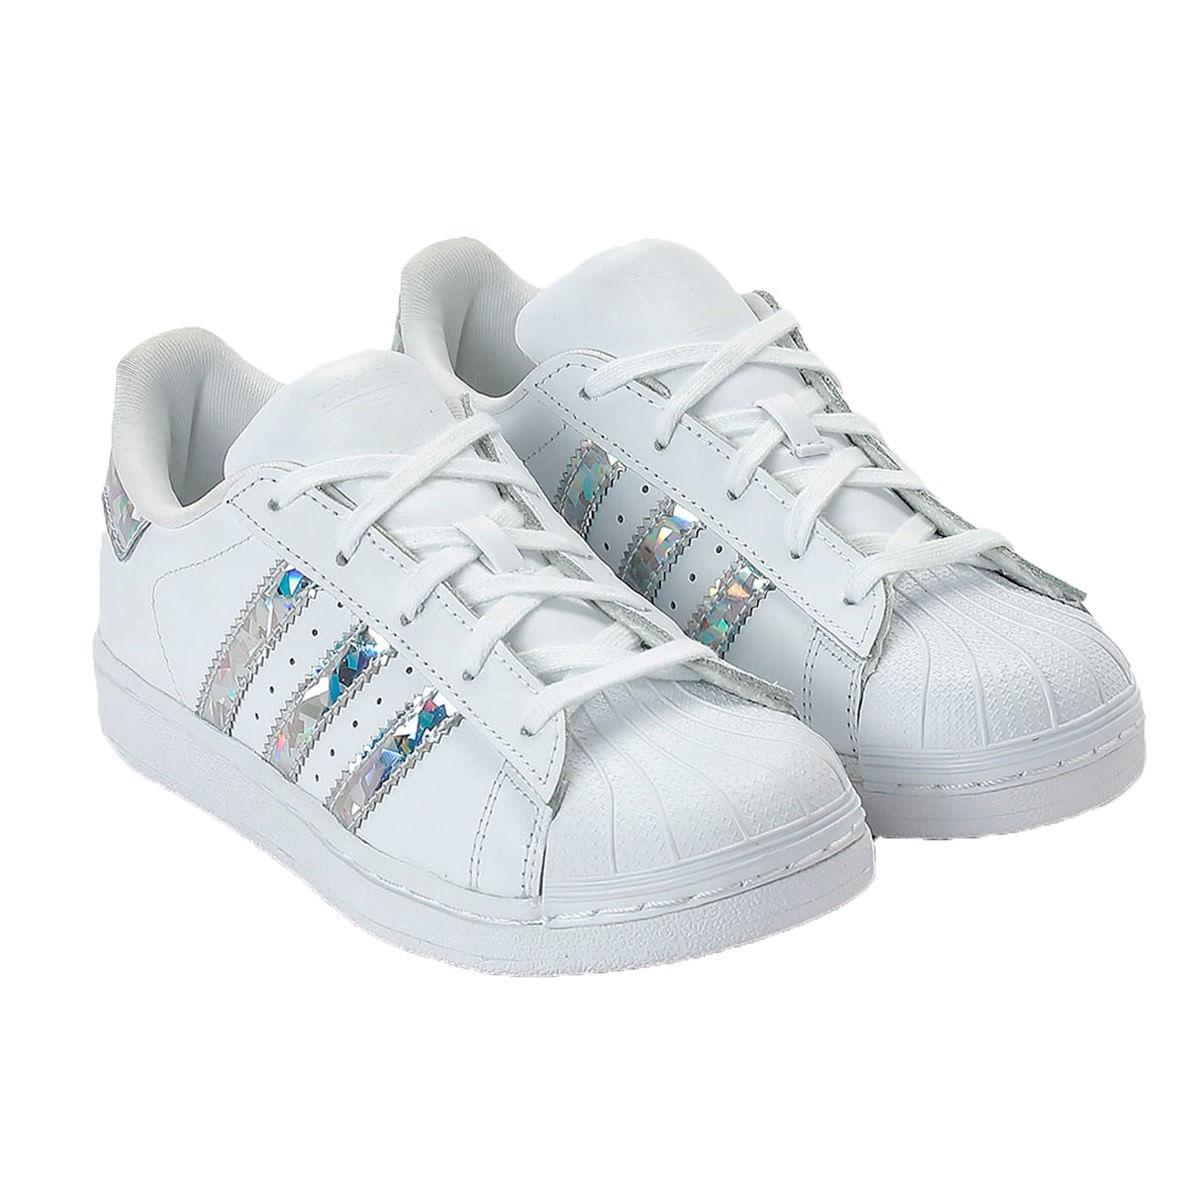 Tenis-Infantil-Adidas-Superstar-J--33-ao-37-